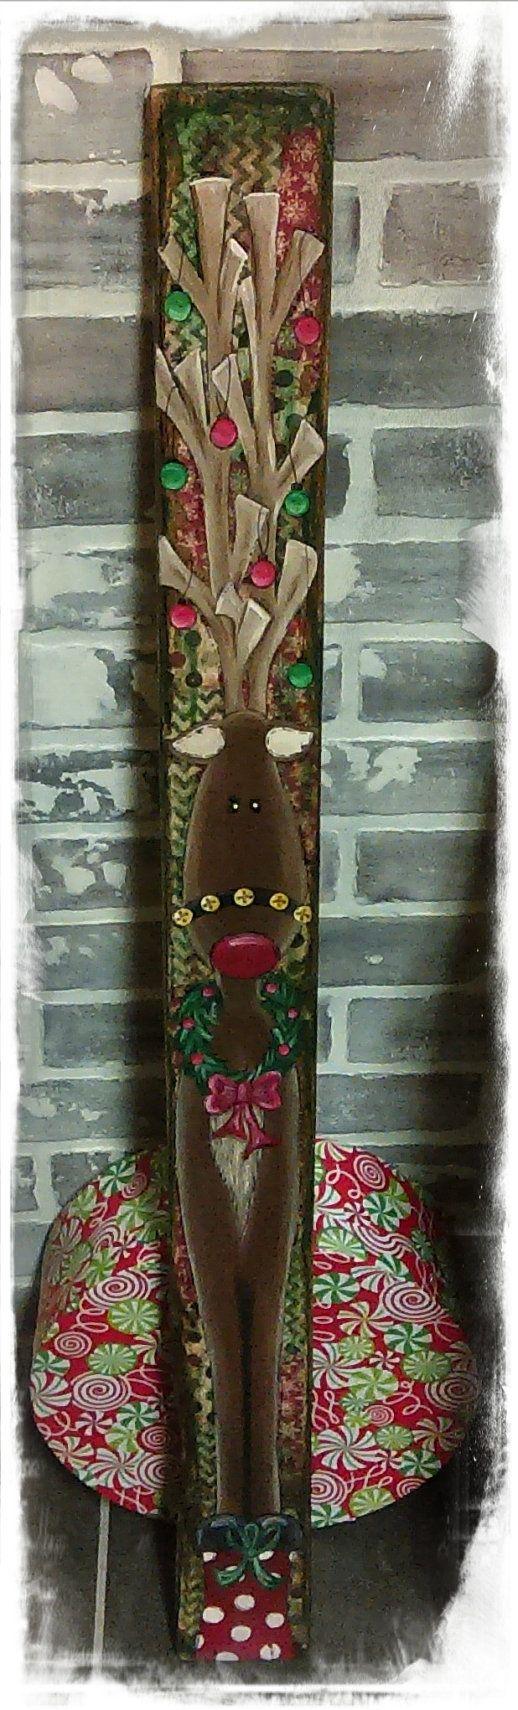 Hand Painted Reindeer Pallet Plank...Wooden by BeatsDesignCo